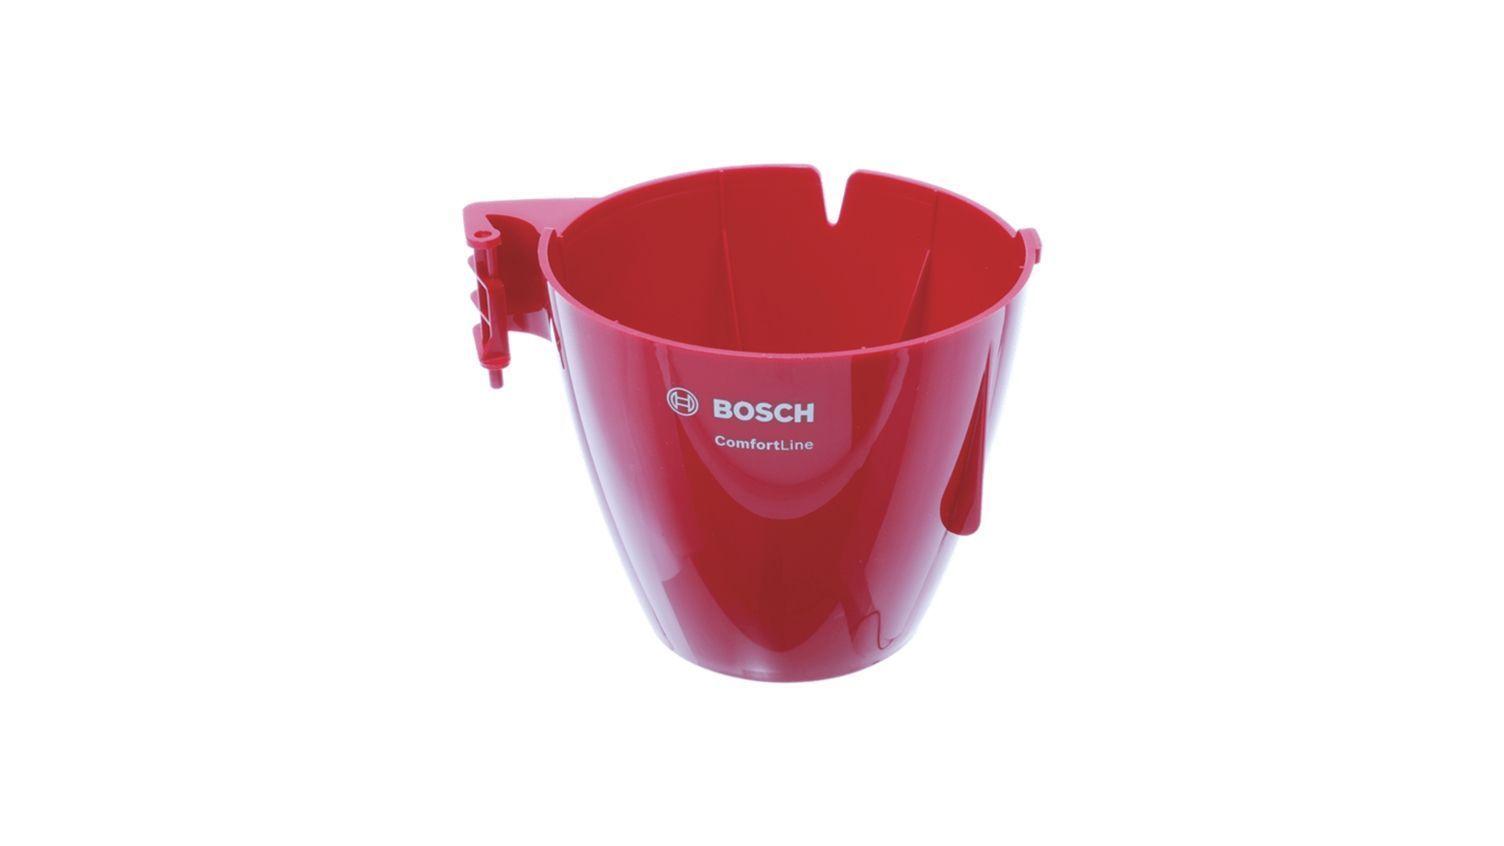 Filter Holder for Bosch Siemens Coffee Makers - 12014355 BSH